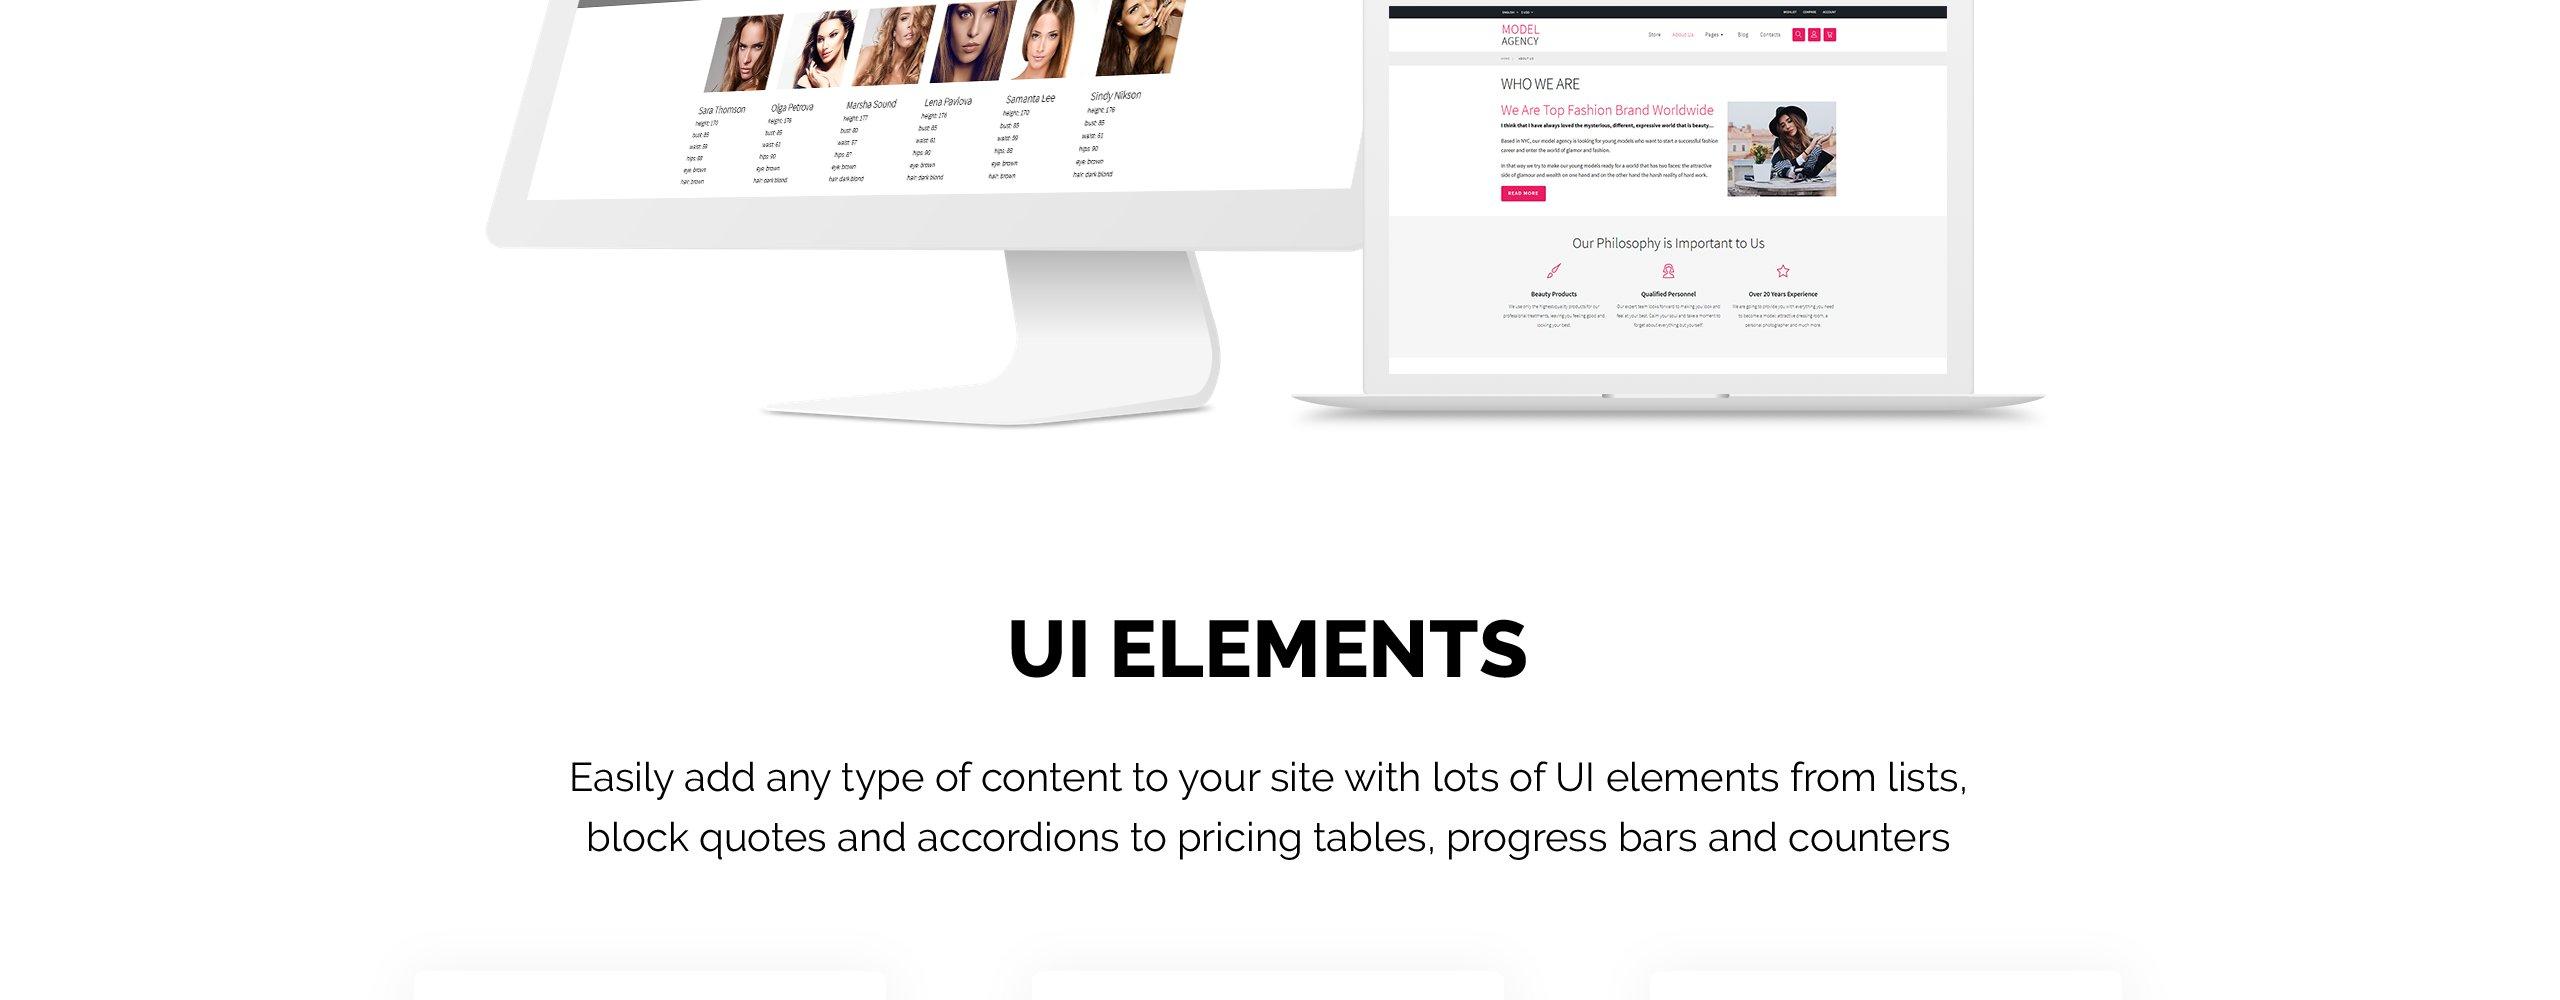 Website Design Template 68721 - beauty girls service portfolio blog portal.     f0a612d7cb9f